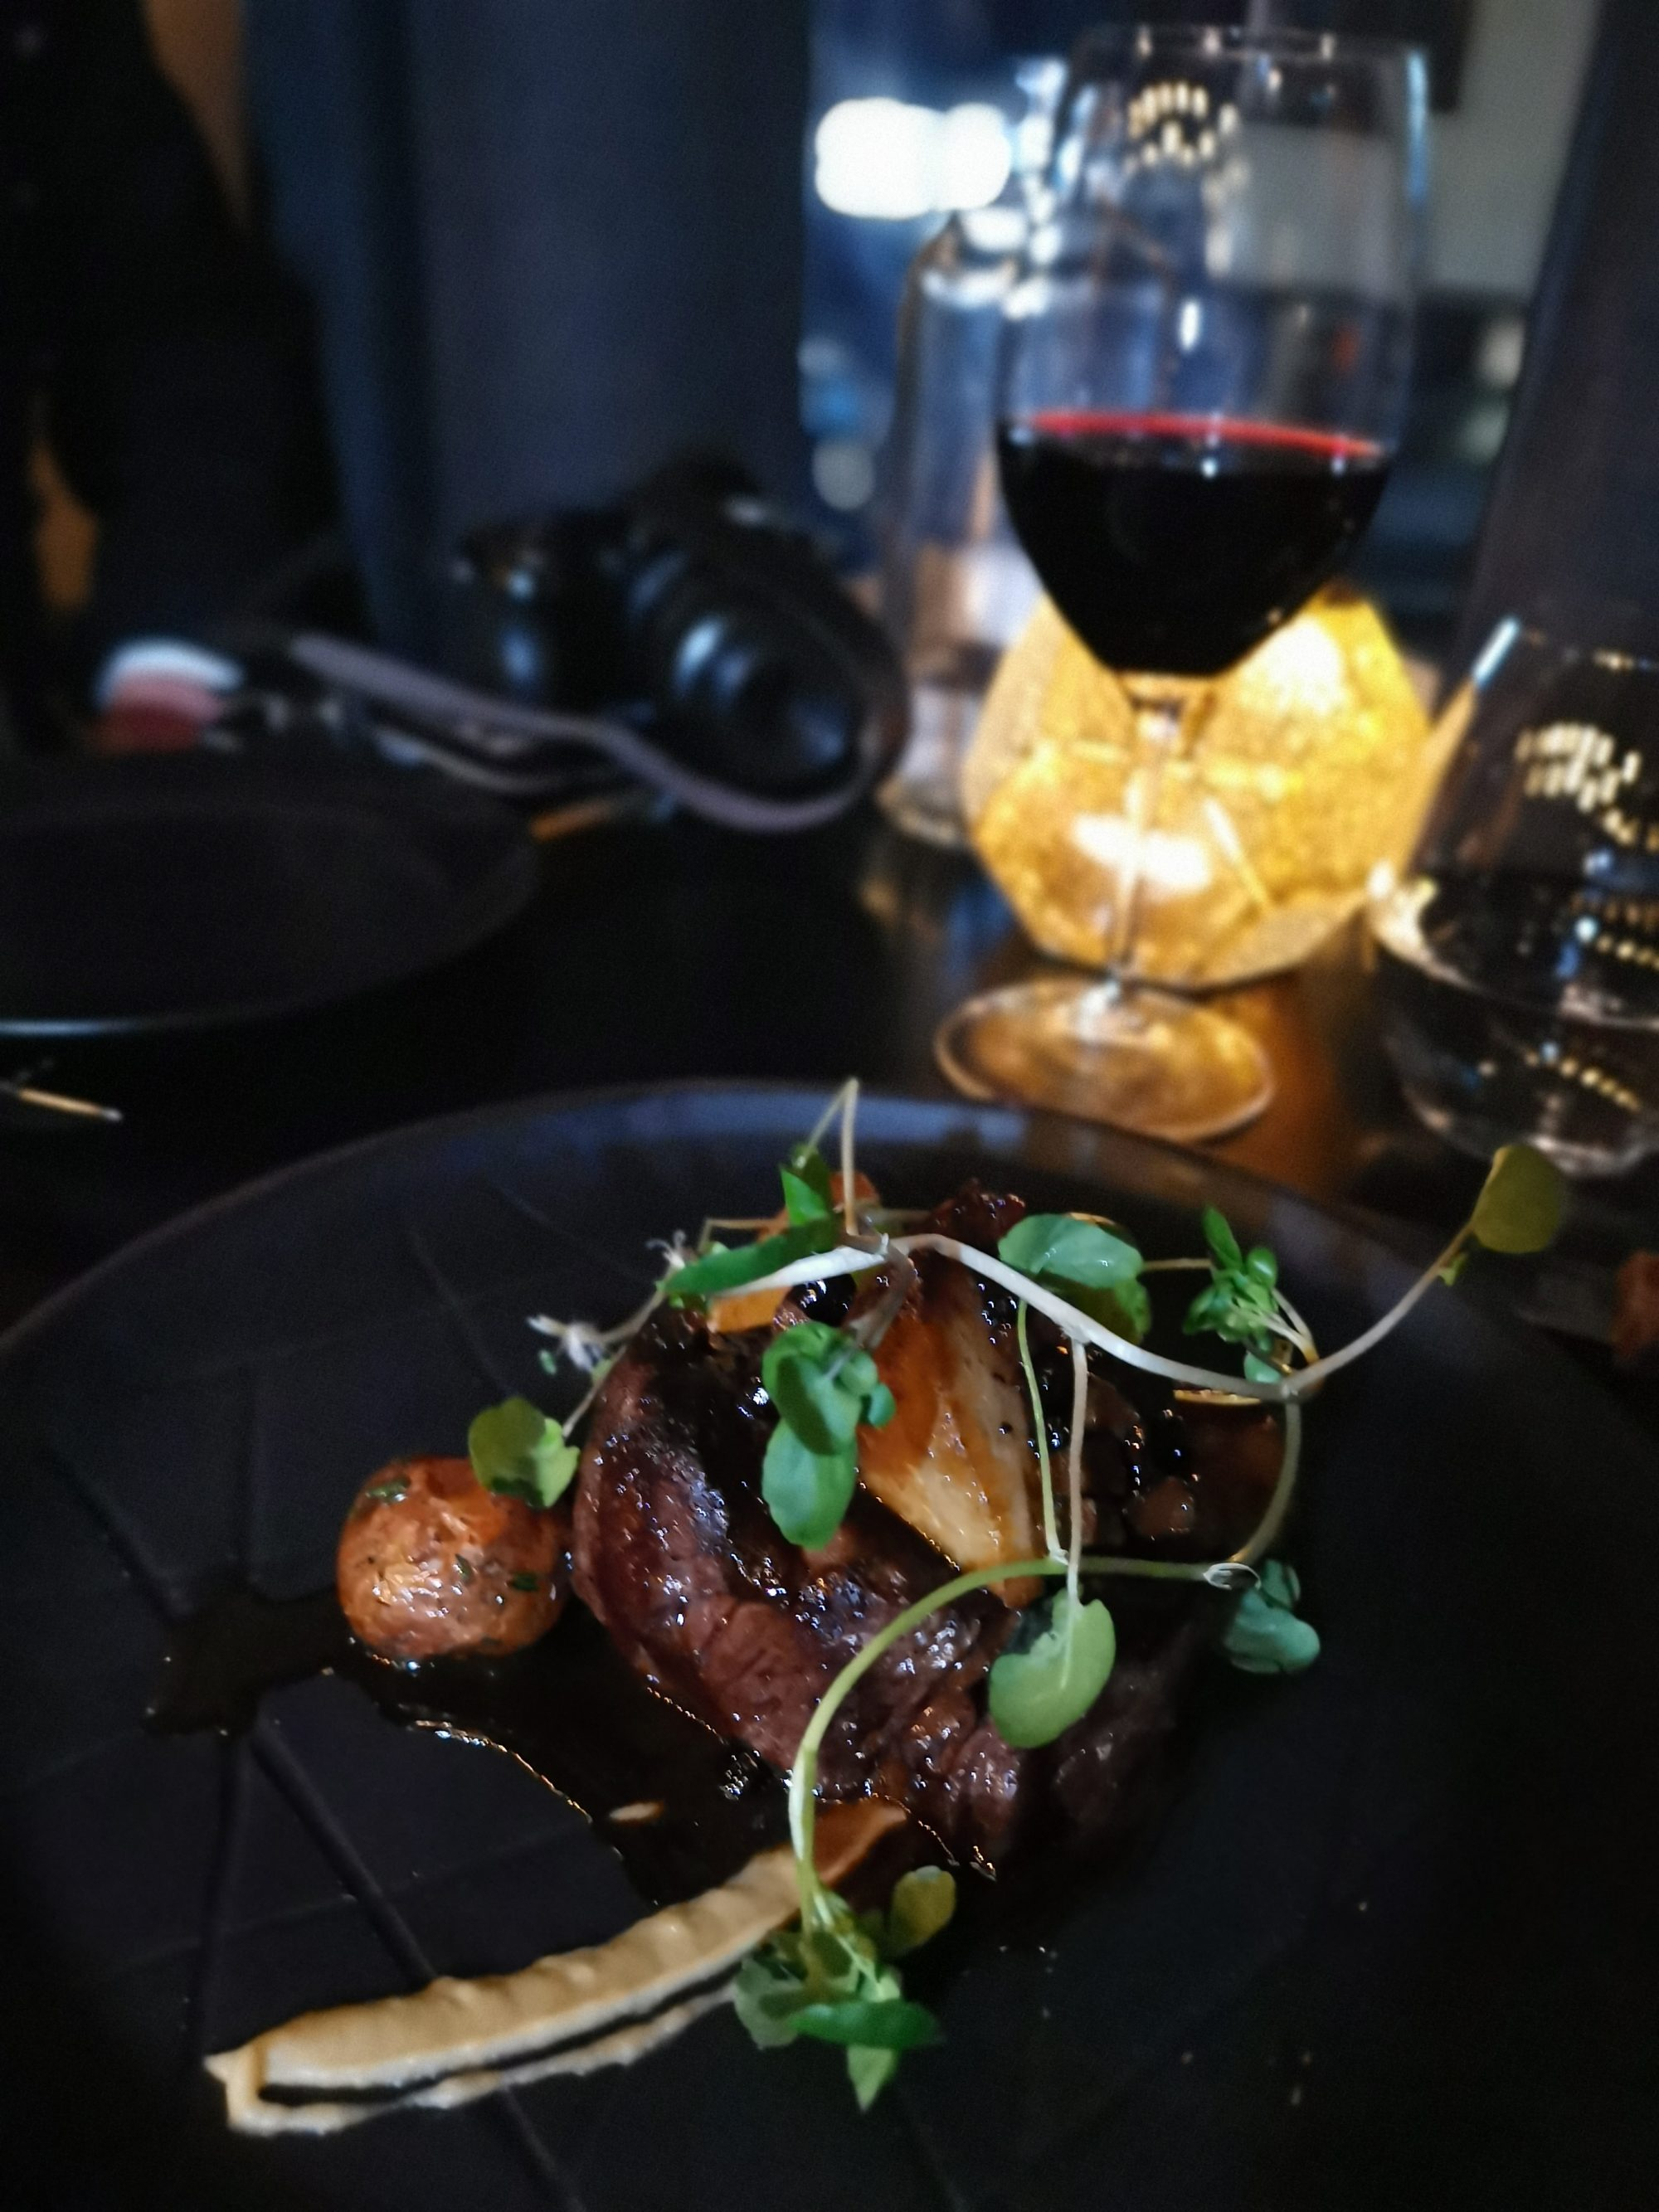 Restauranger i Reyjkavik - 9 tips